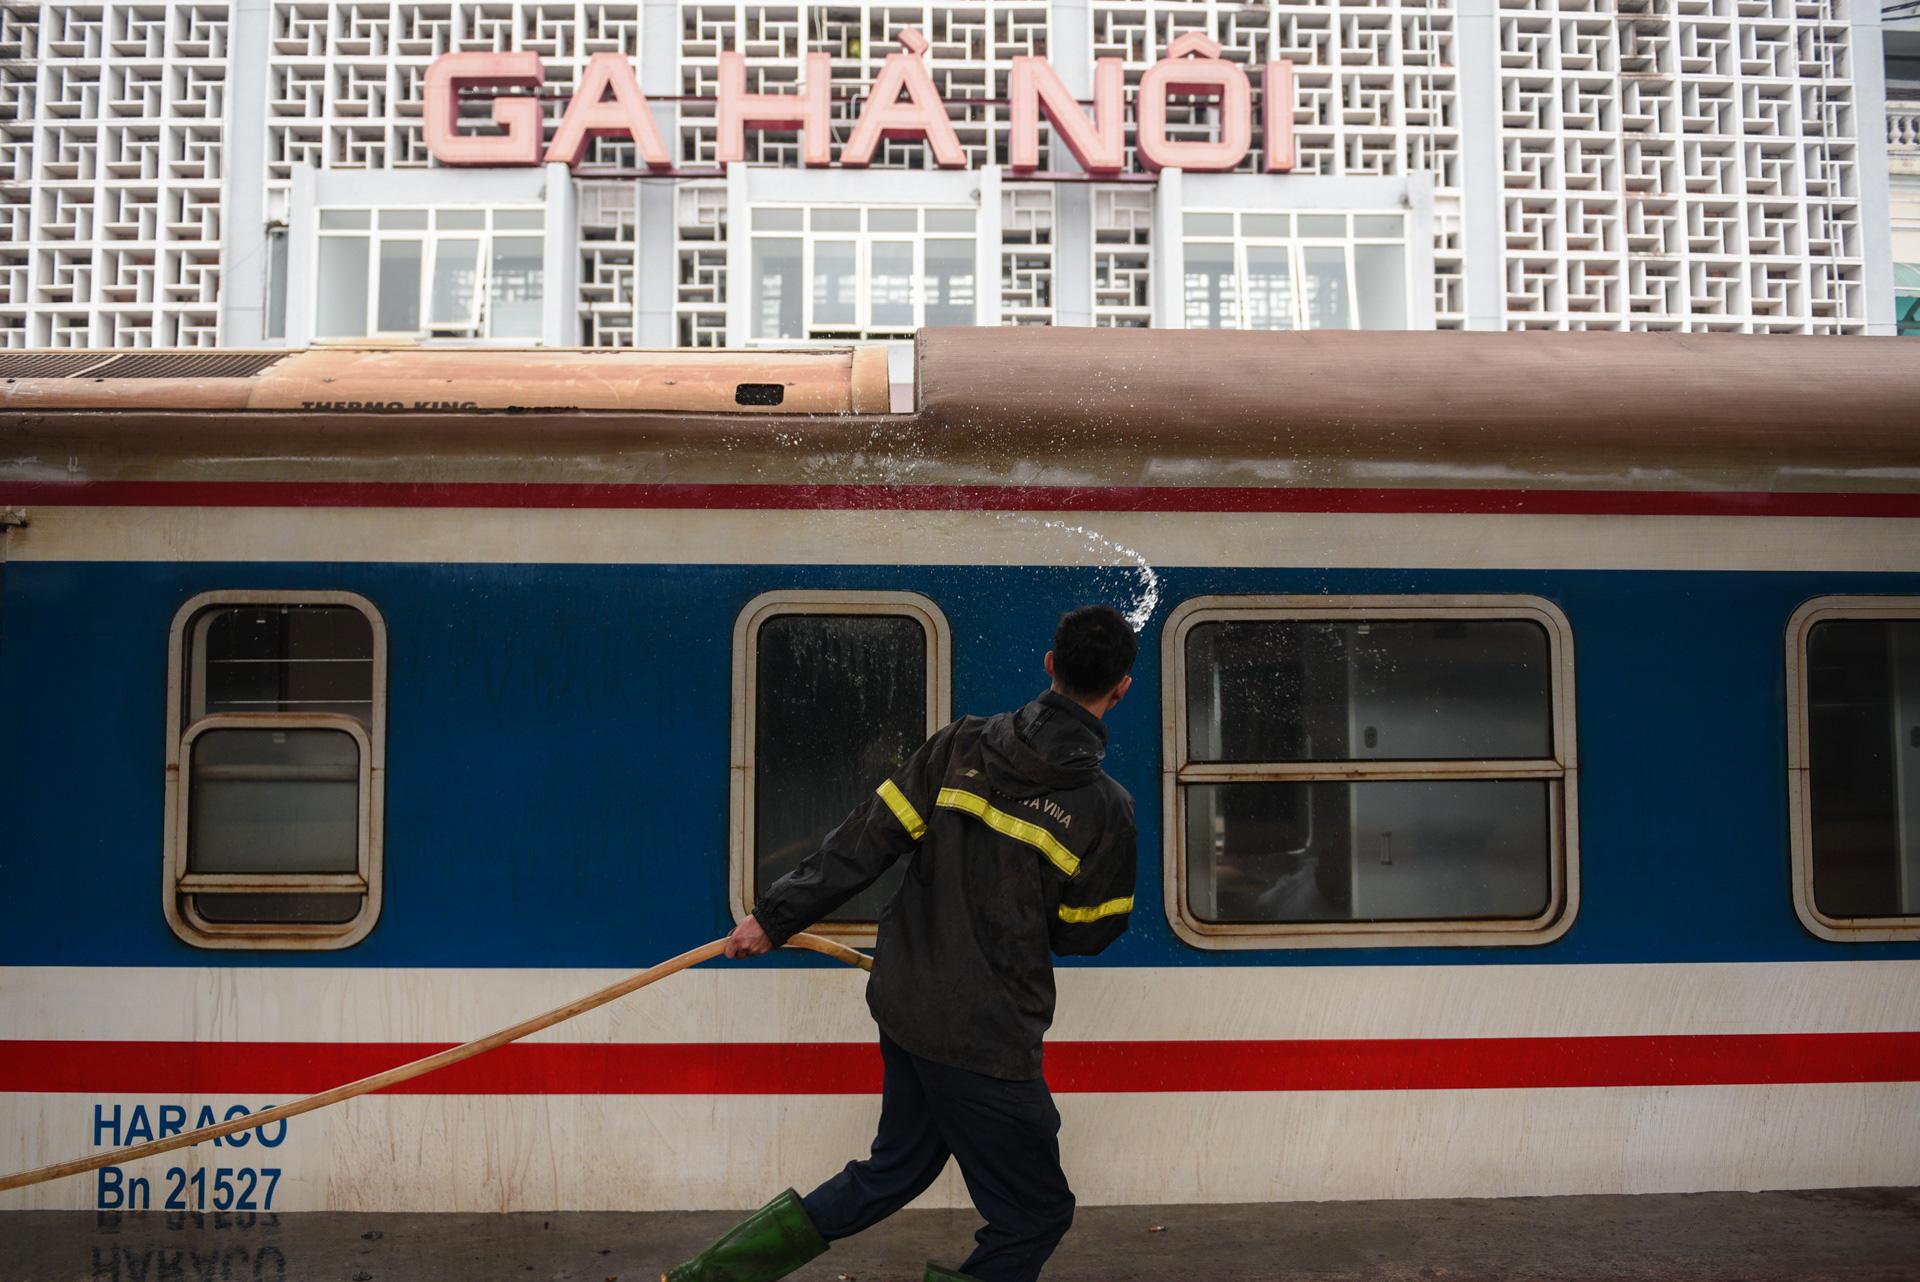 Tet tren nhung chuyen tau cuoi cung cua nam Ky Hoi hinh anh 3 DSC_2393_zing.jpg